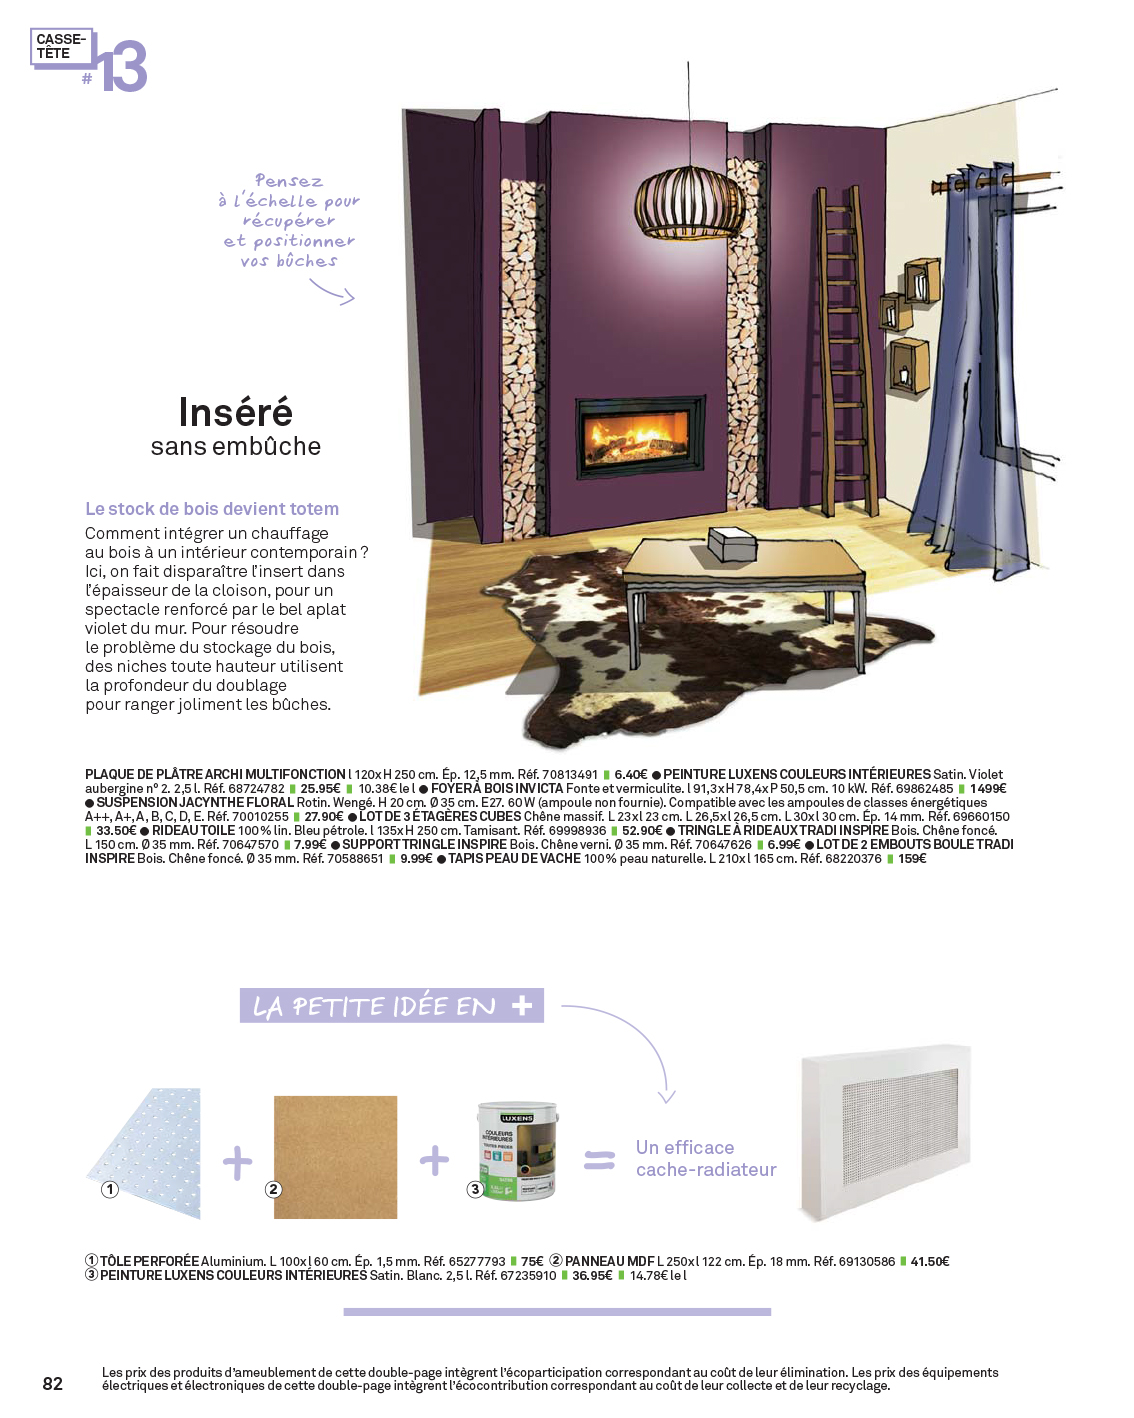 Stylisme Pour Le Magazine Leroy Merlin Sophie Embs